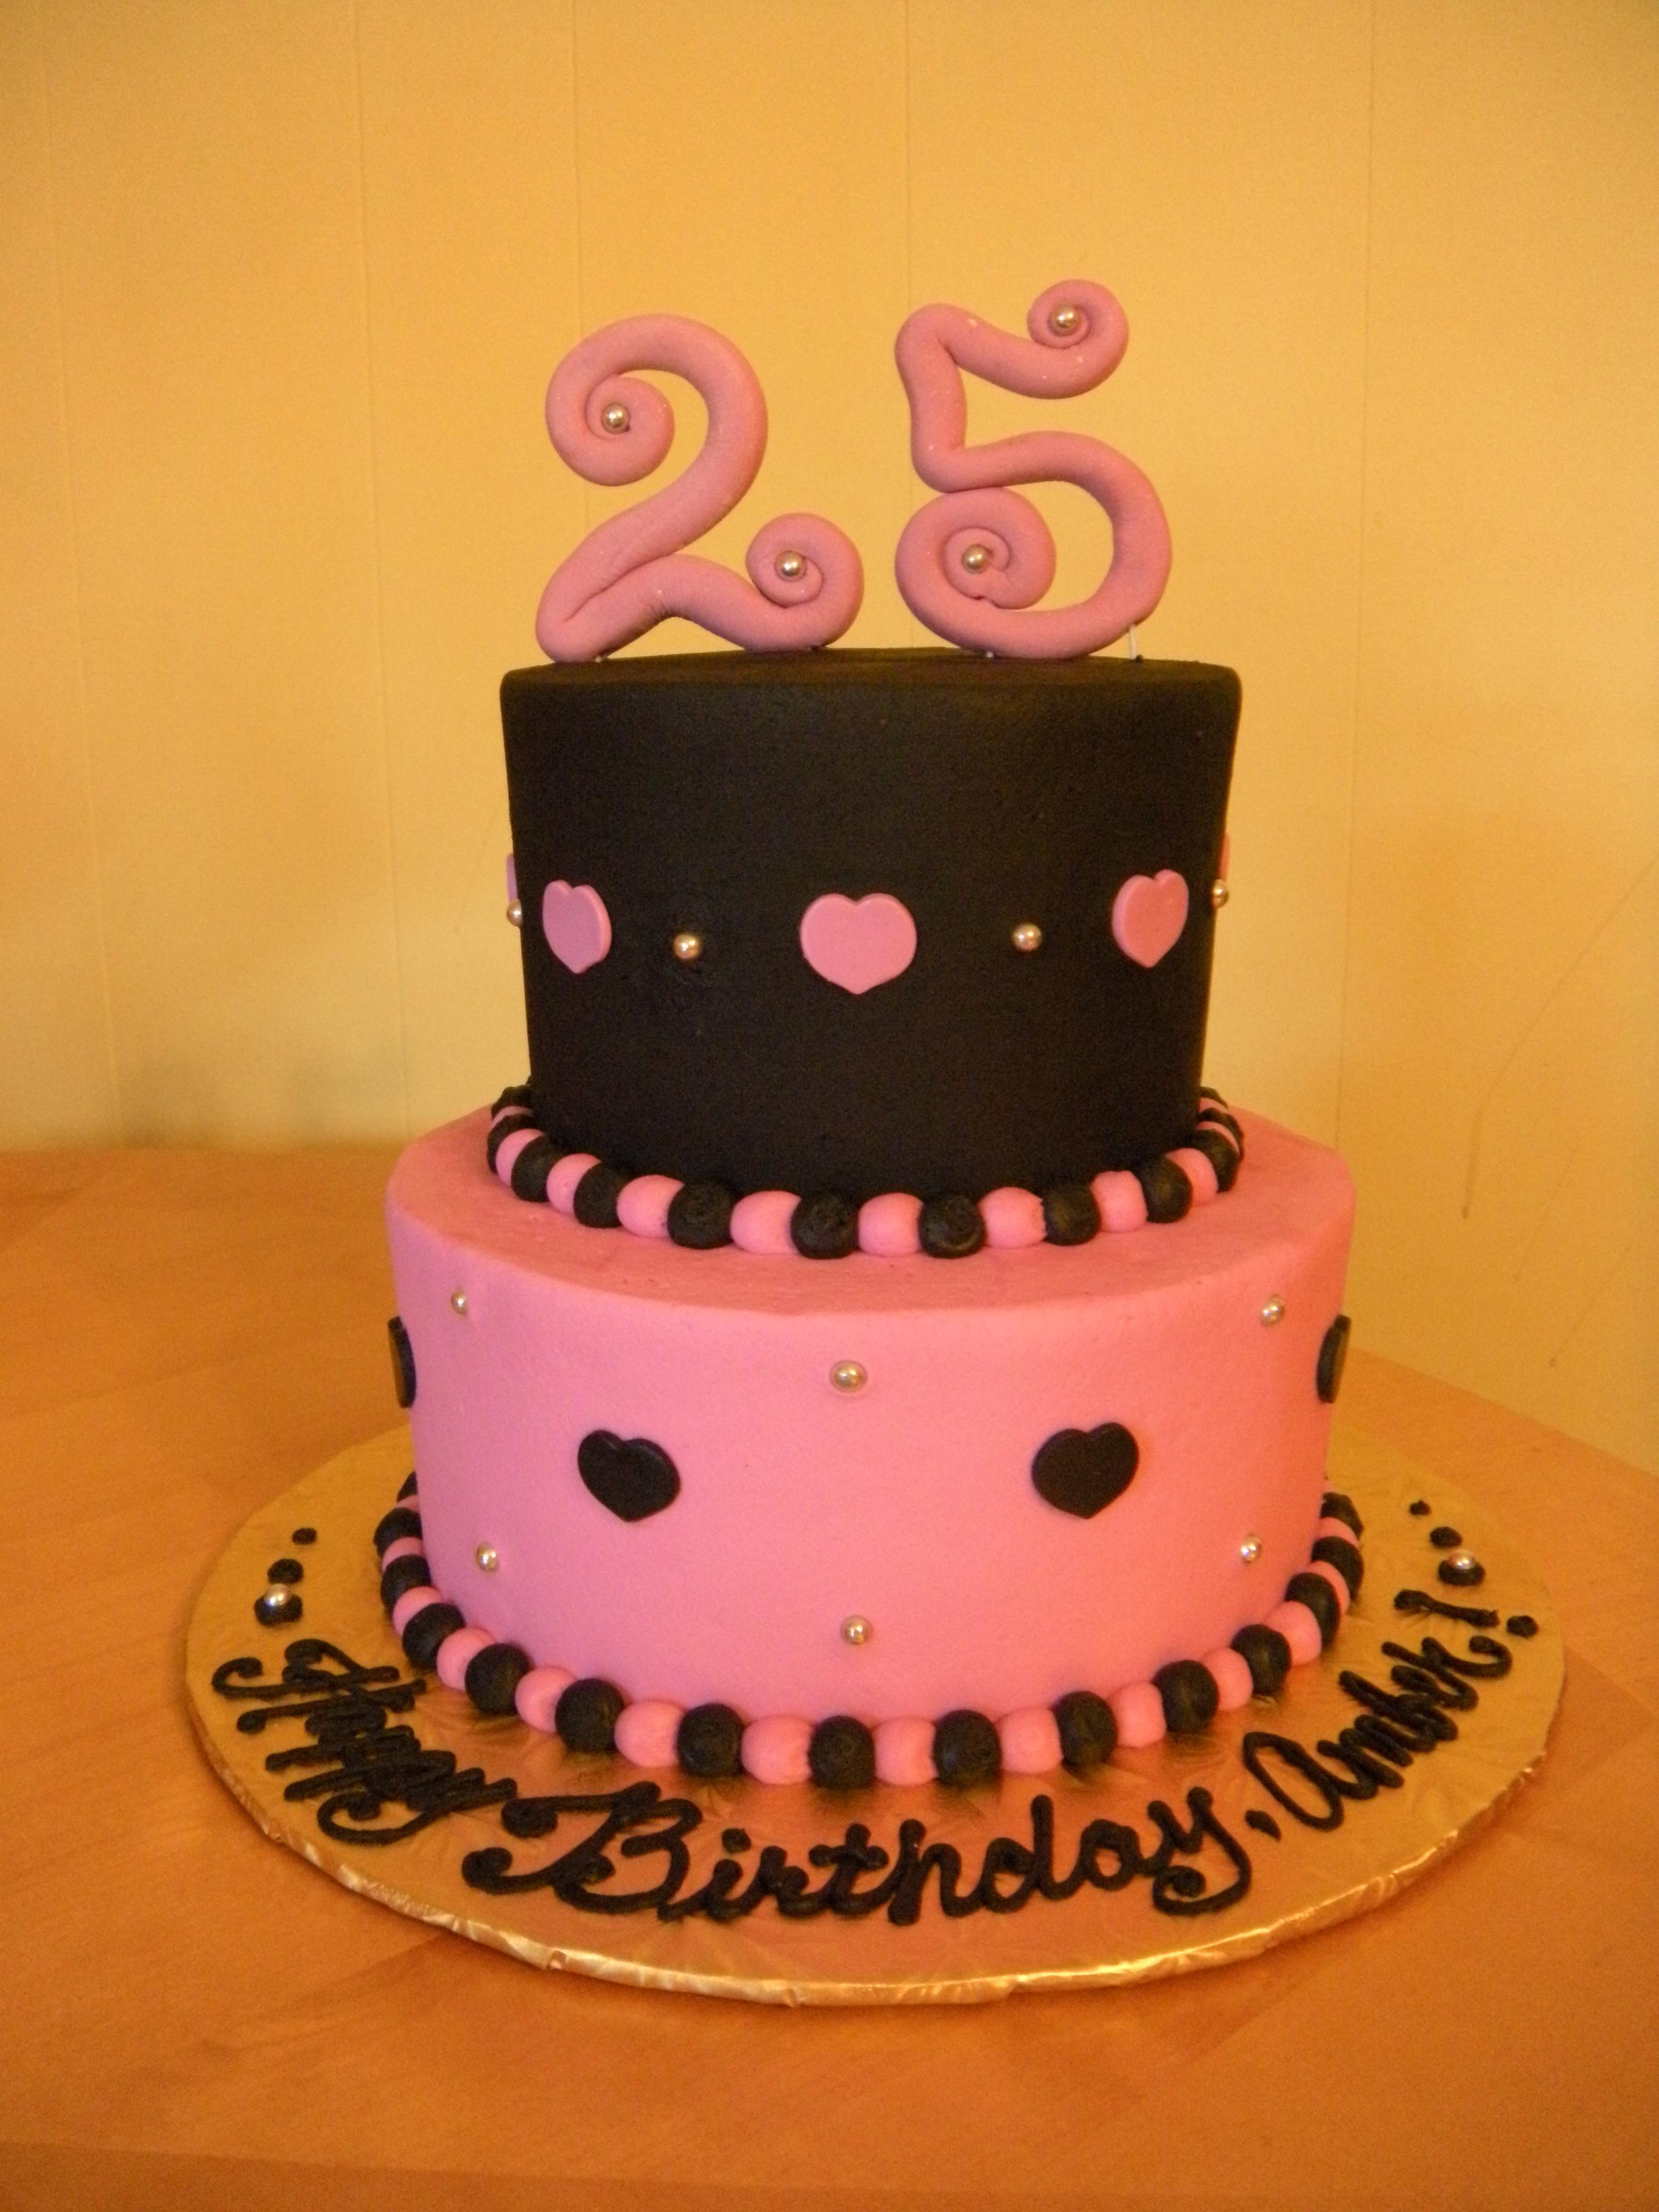 13 25th Birthday Cakes For Women Photo 25th Birthday Cake Ideas